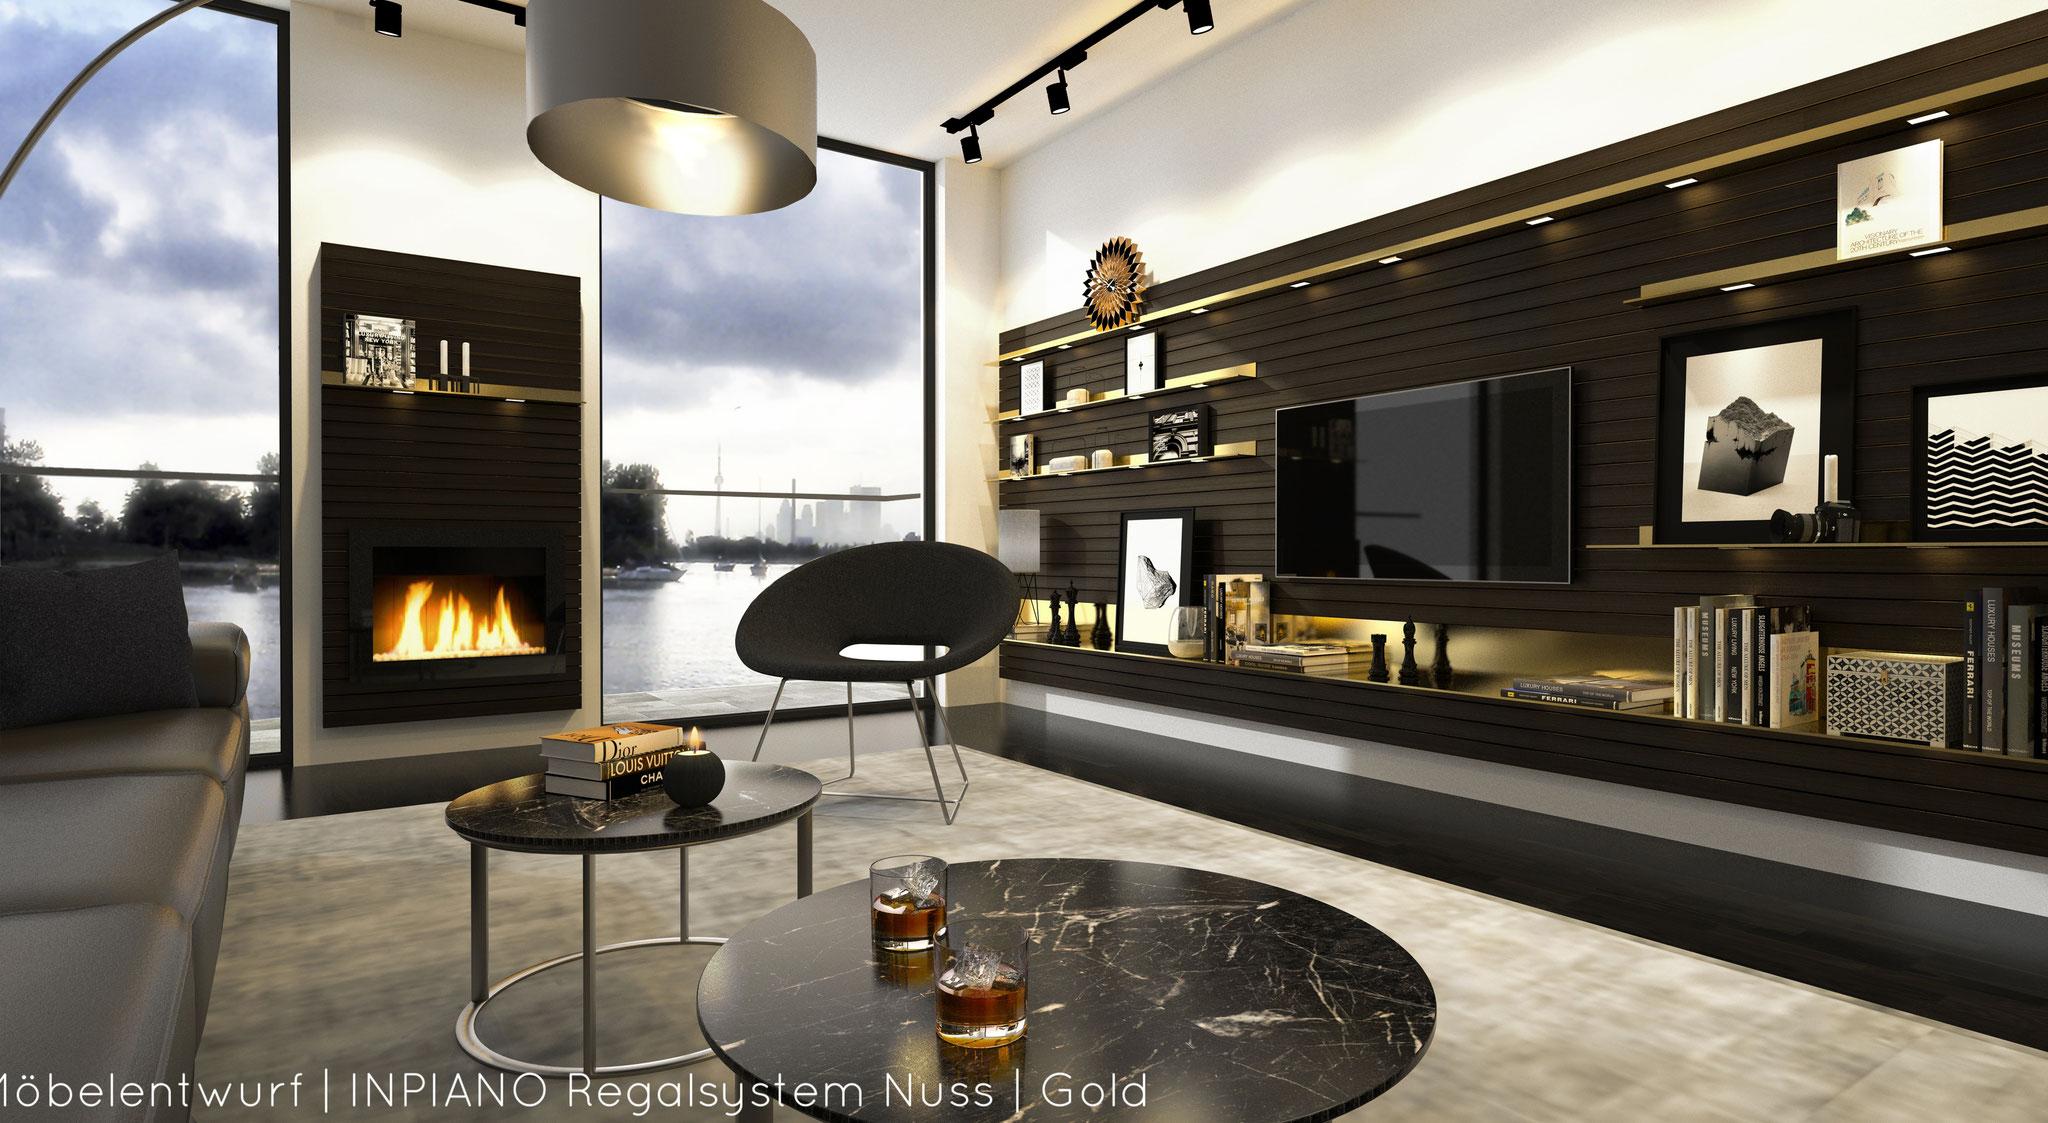 Möbelentwurf | INPIANO Regalsystem Nuss | Gold